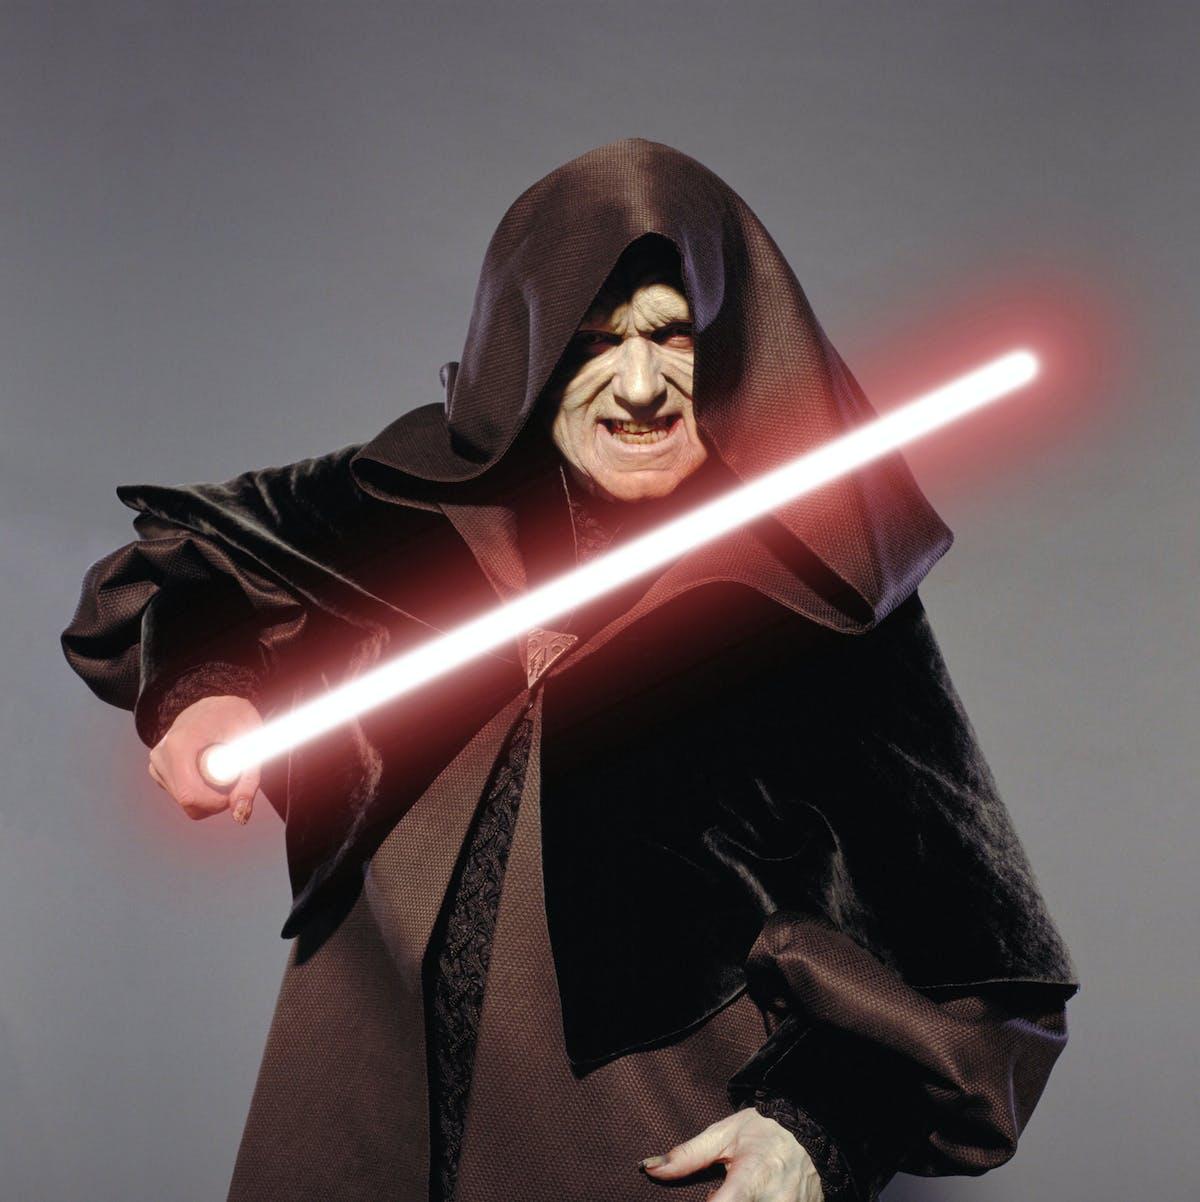 'Star Wars 9' spoilers: Forgotten villain may explain Palpatine's return